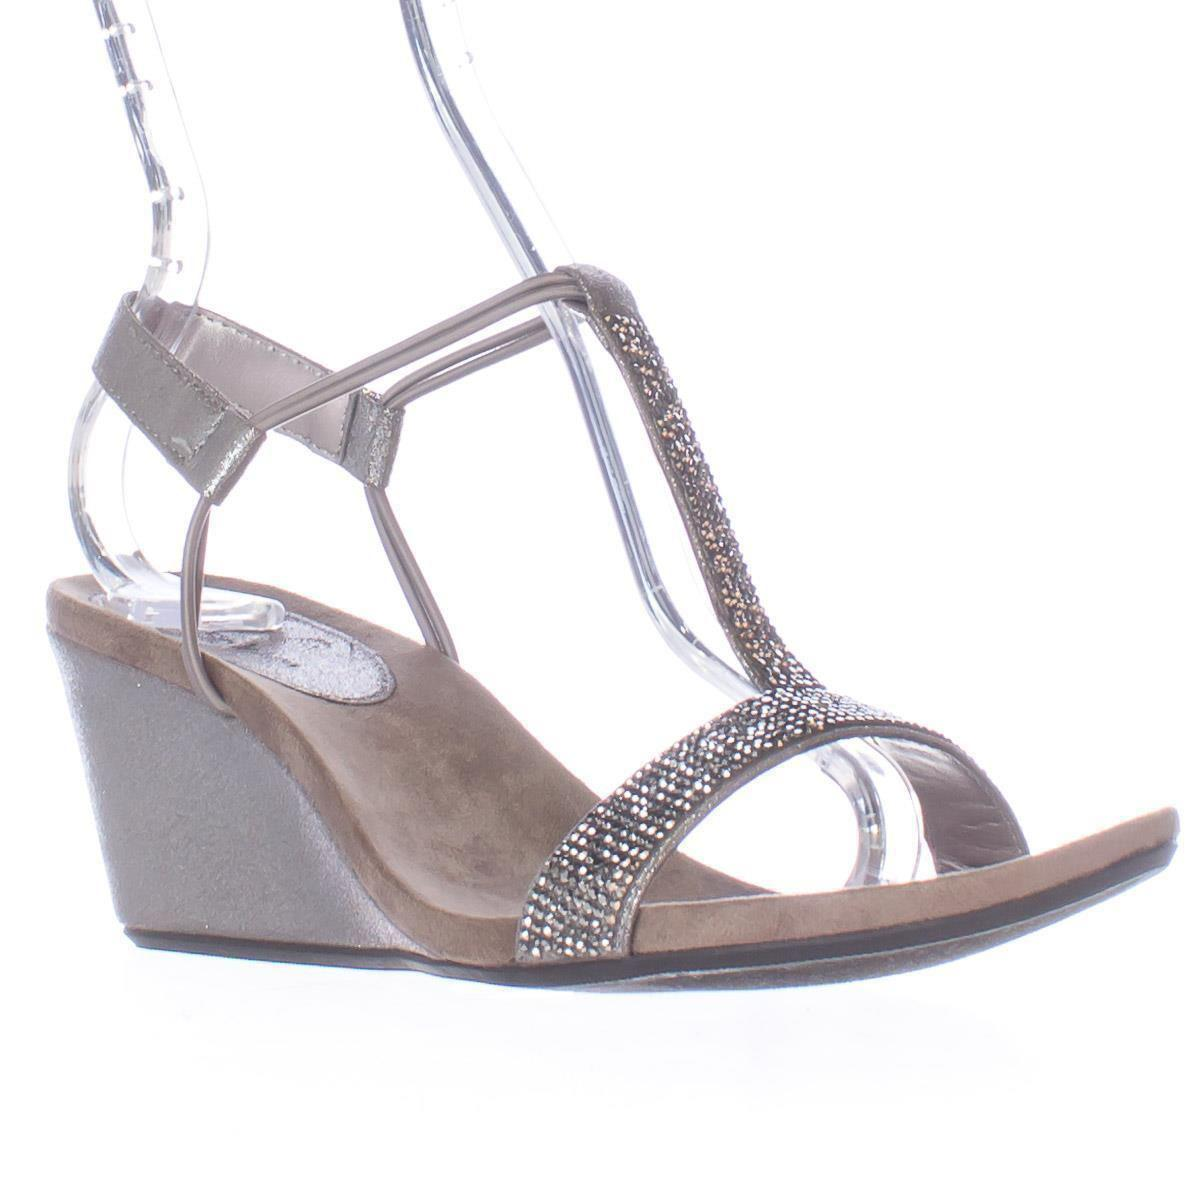 6cf827b0c025 Lyst - Style   Co. Sc35 Mulan2 T-strap Sandals